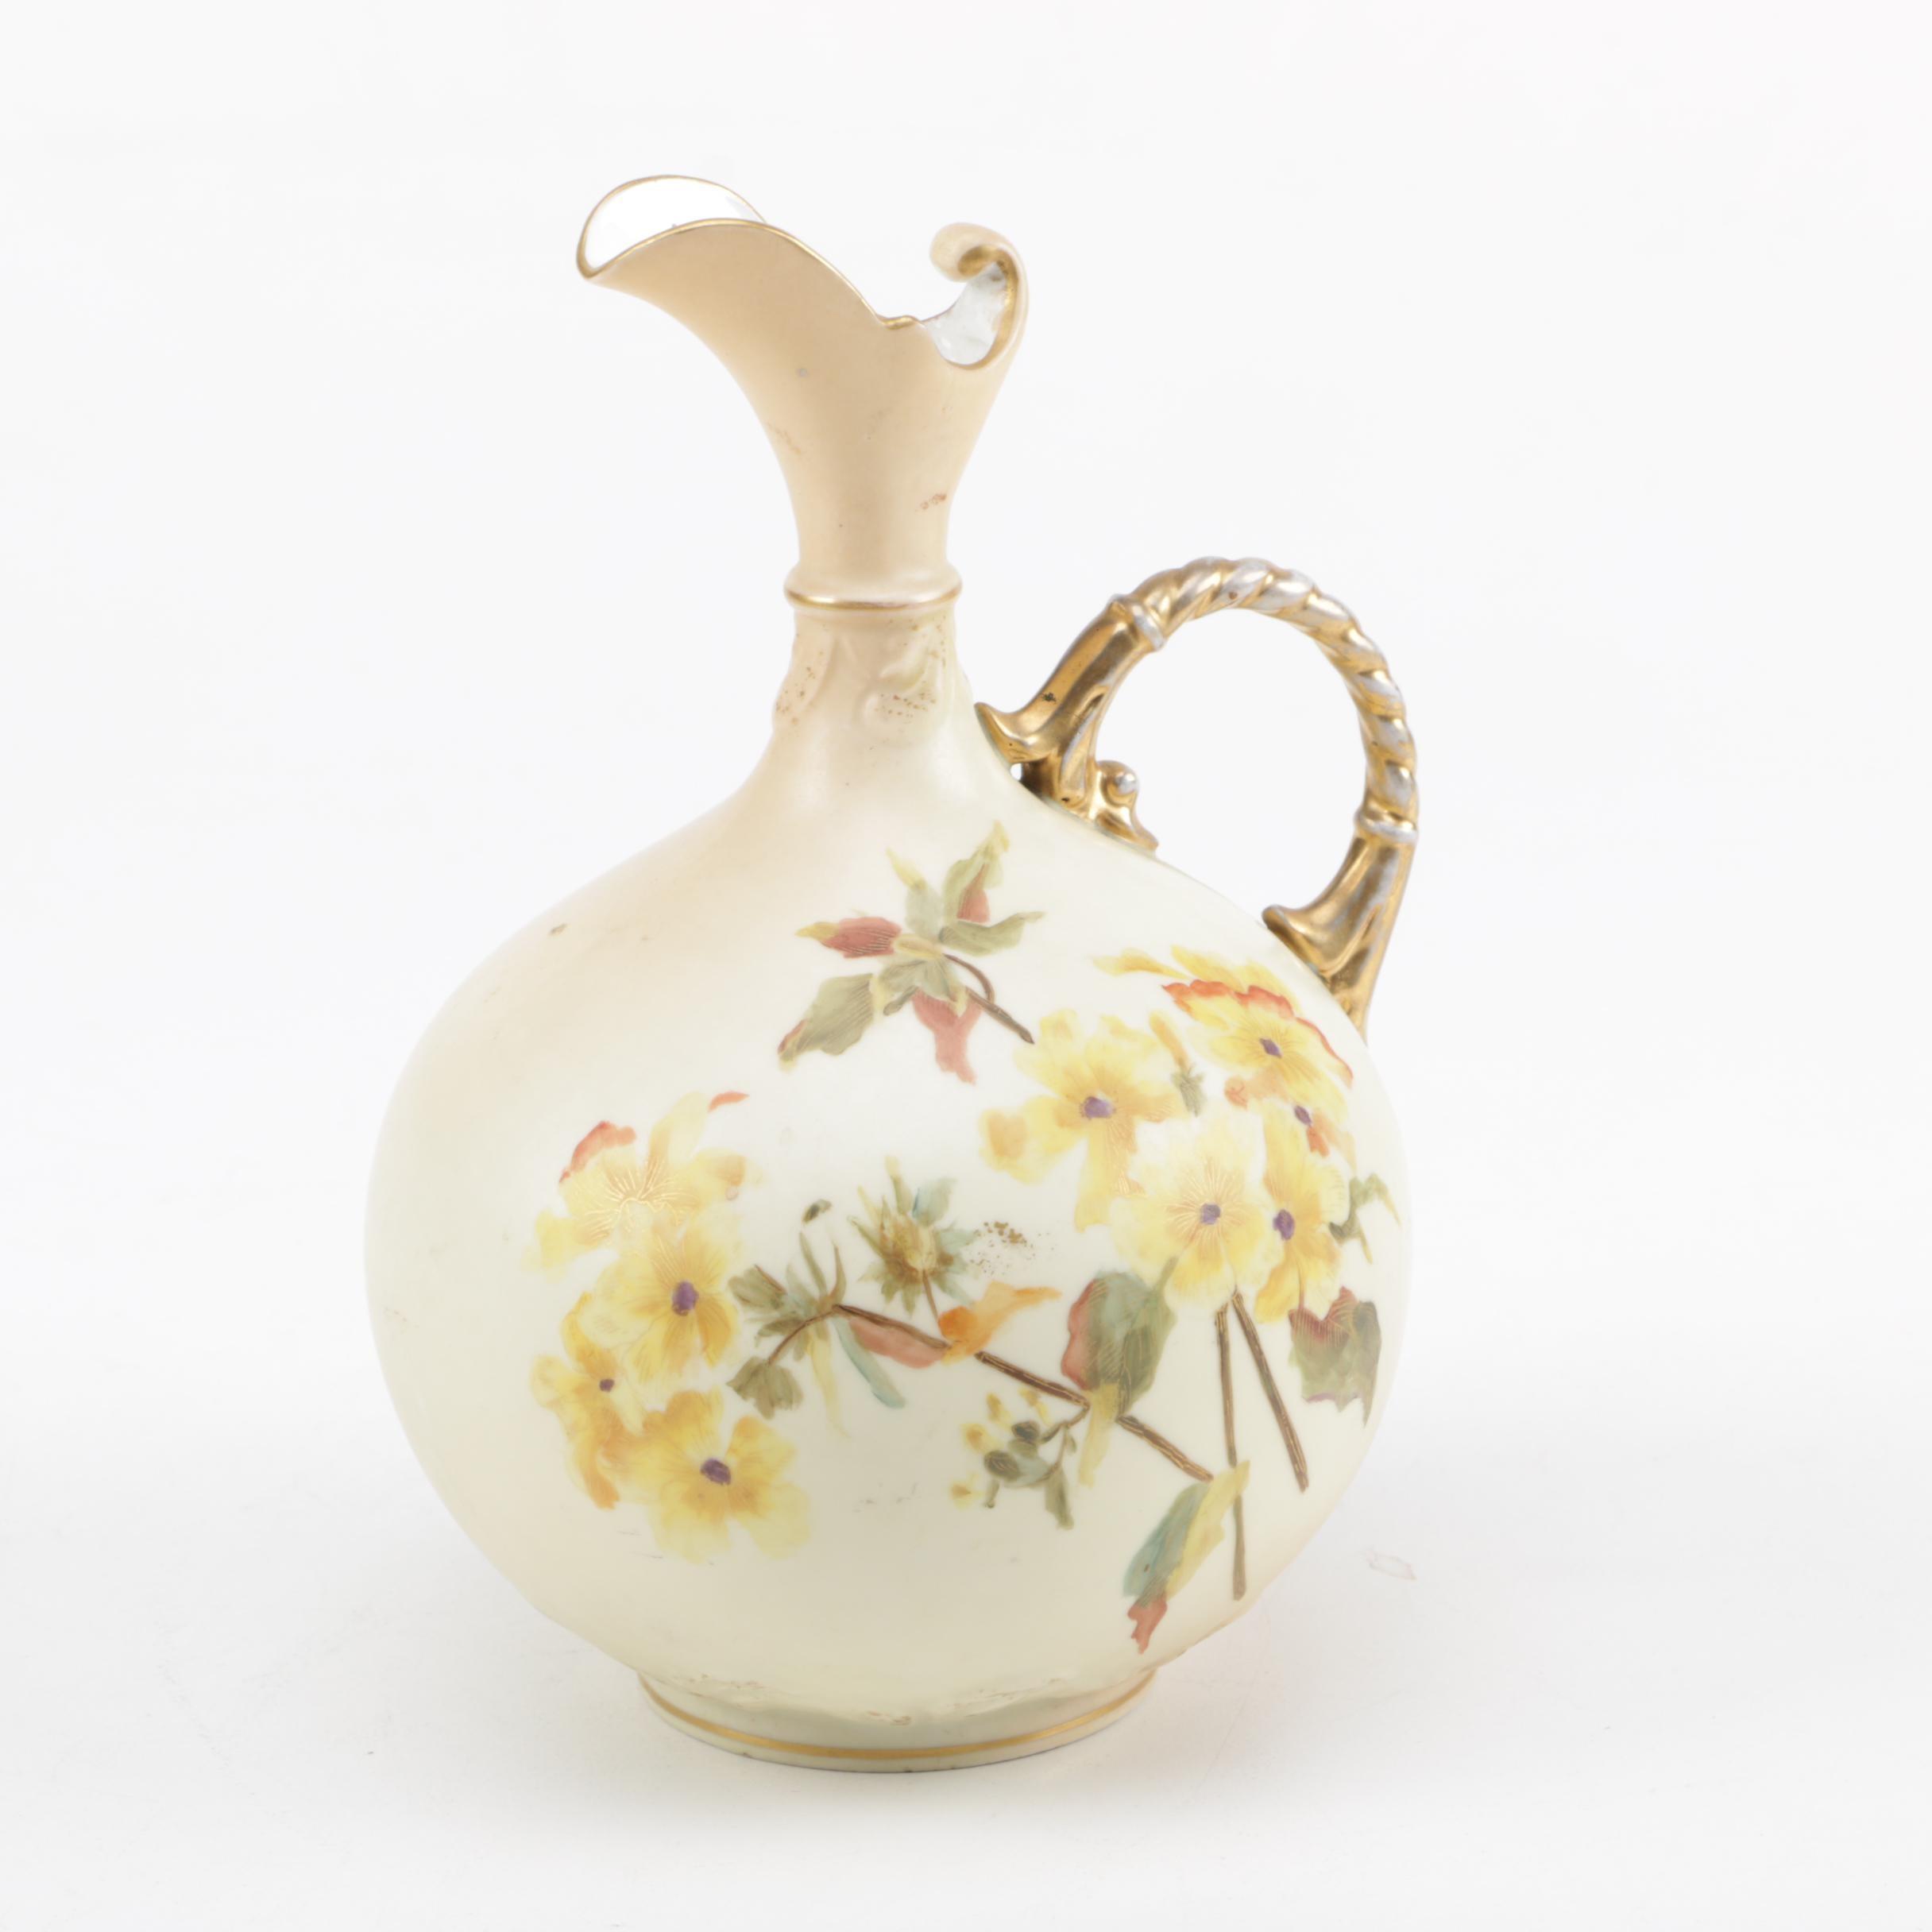 Antique Rudolstadt Porcelain Pitcher